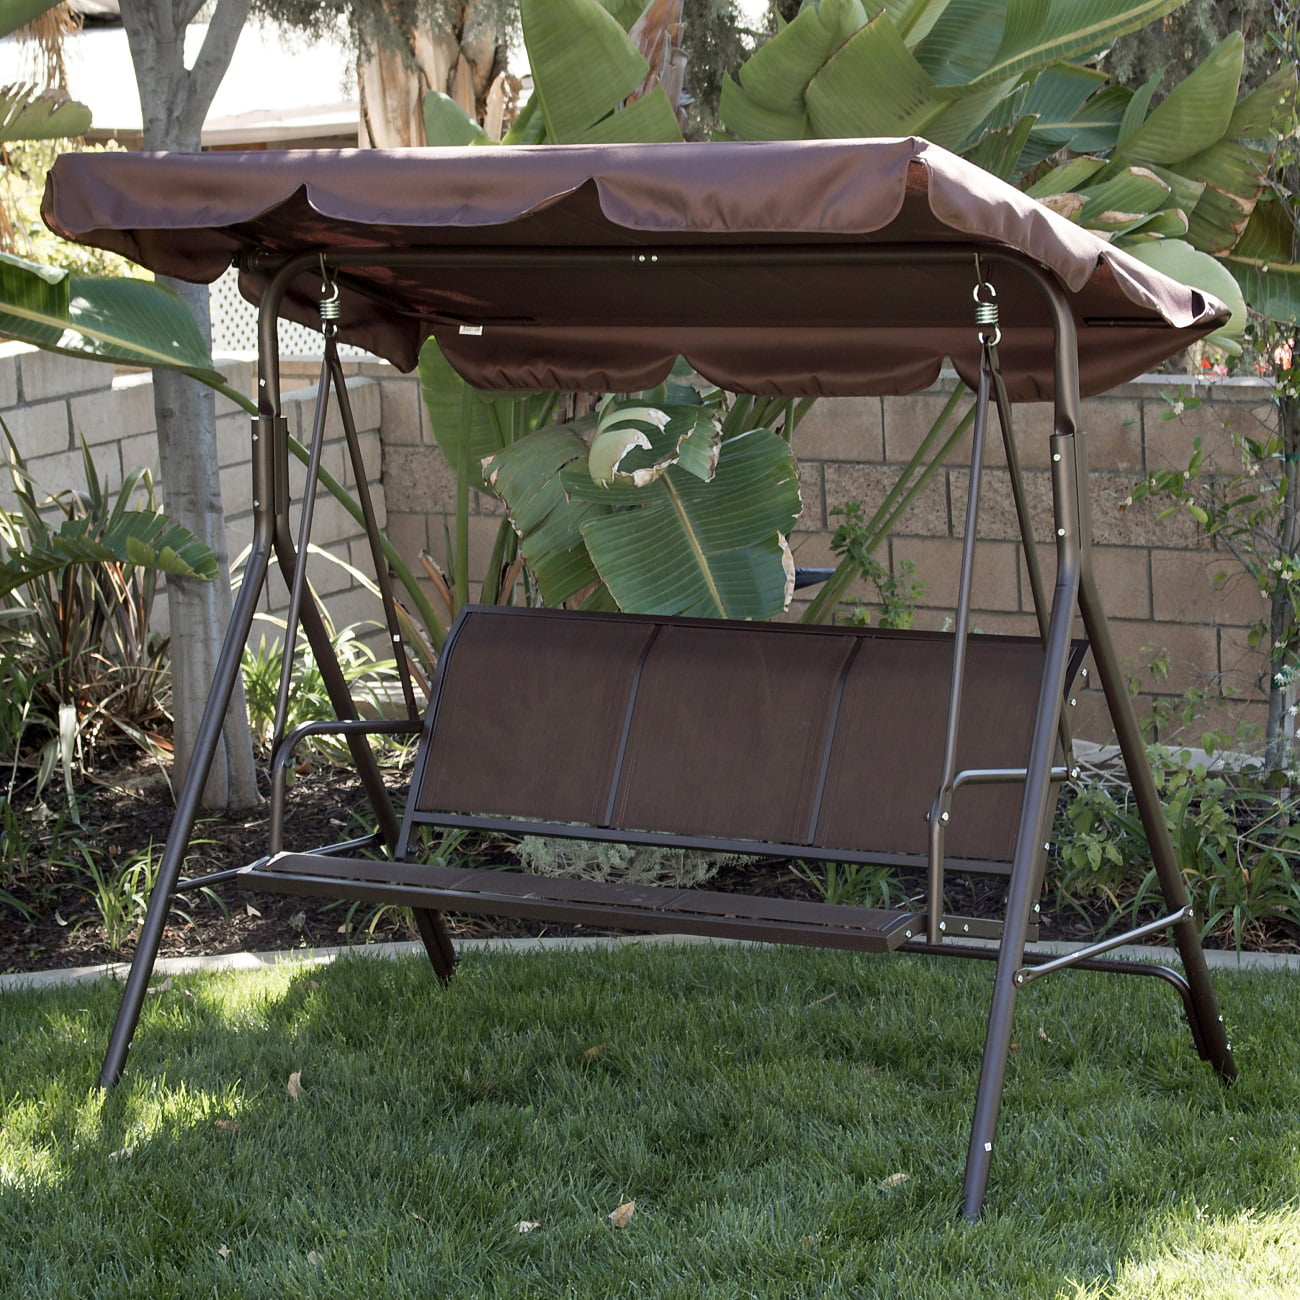 BELLEZE Porch Swing Glider Outdoor Chair Top Tilt UV Resistant Shade Steel Frame 3 Seater Adjustable Sunshade Dark Brown by Belleze